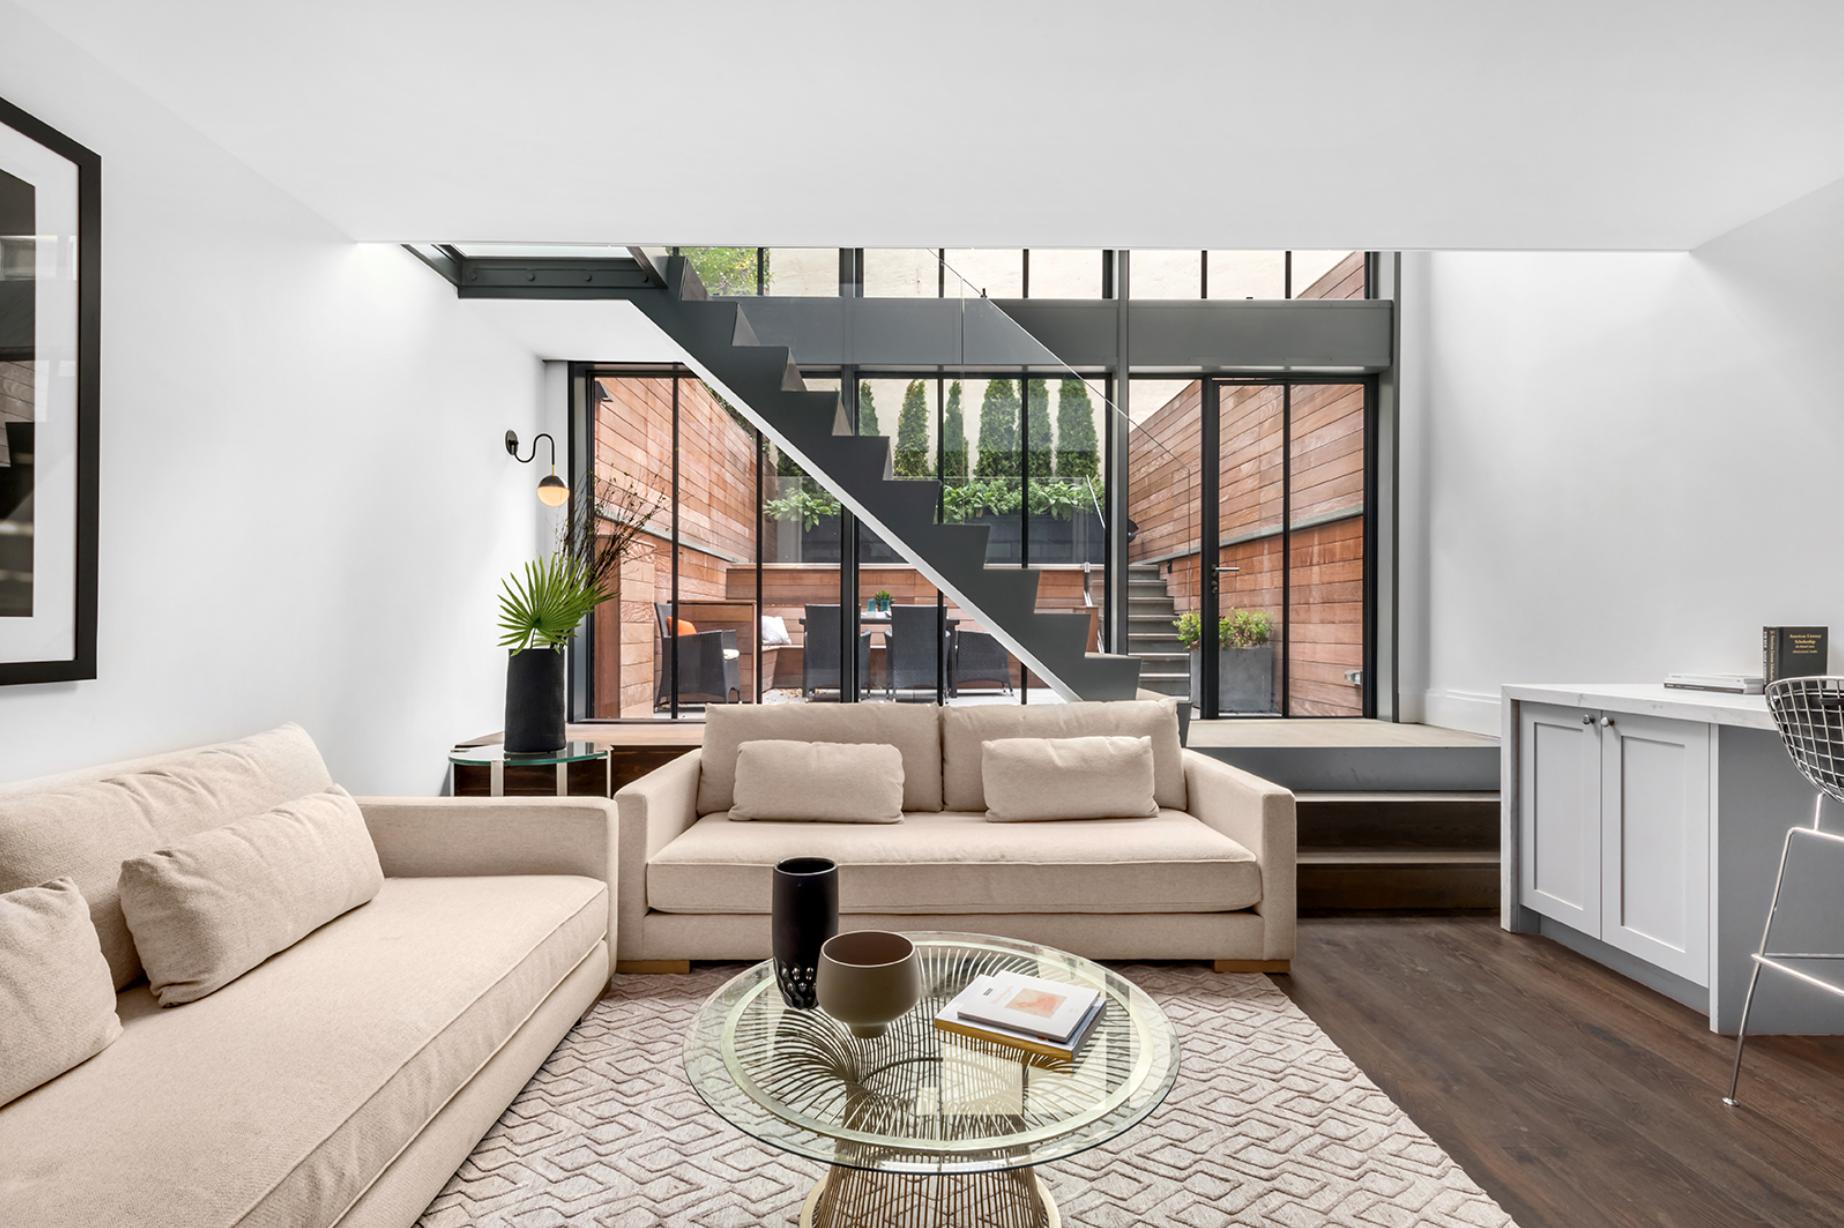 Featured Listing: Explore A Luxurious Span-Architecture-Designed West Village Townhouse Asking $16.95 Million